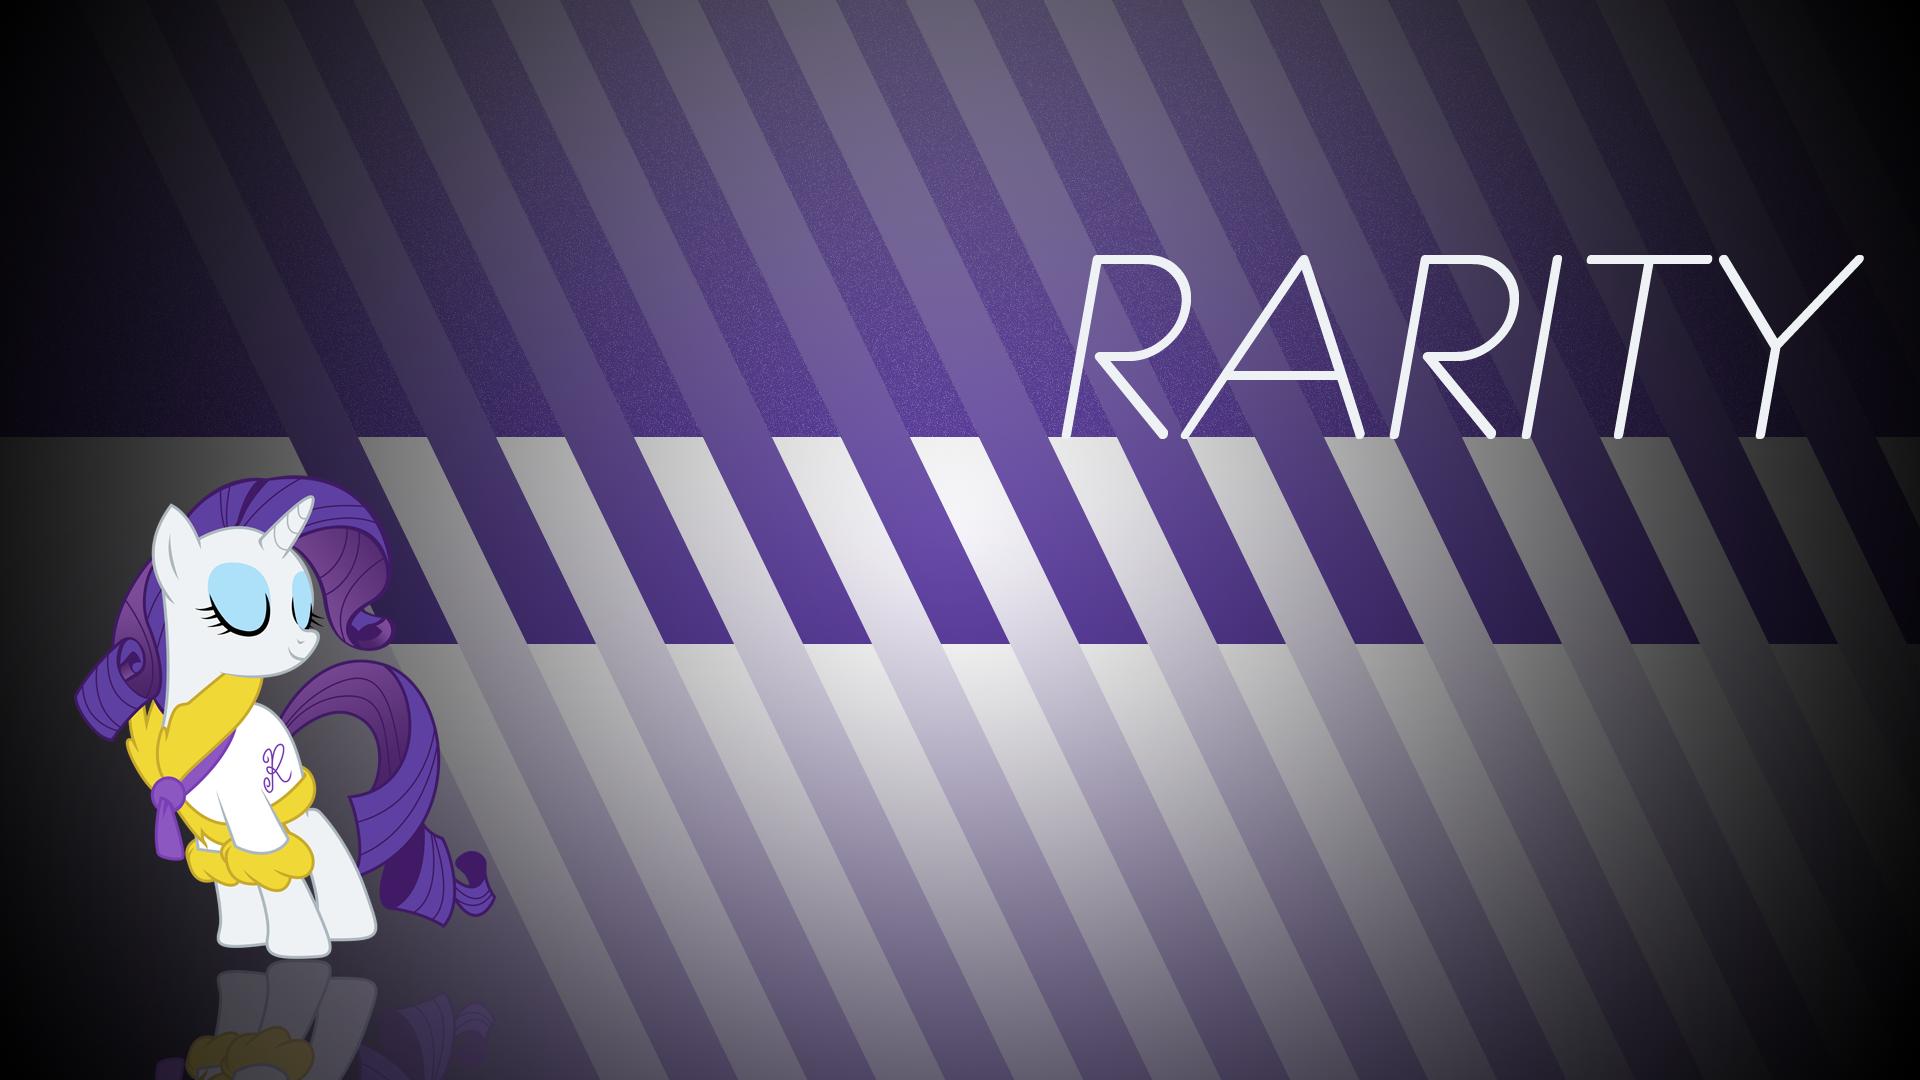 Rarity in Stripes by ikonradx and Kooner-cz